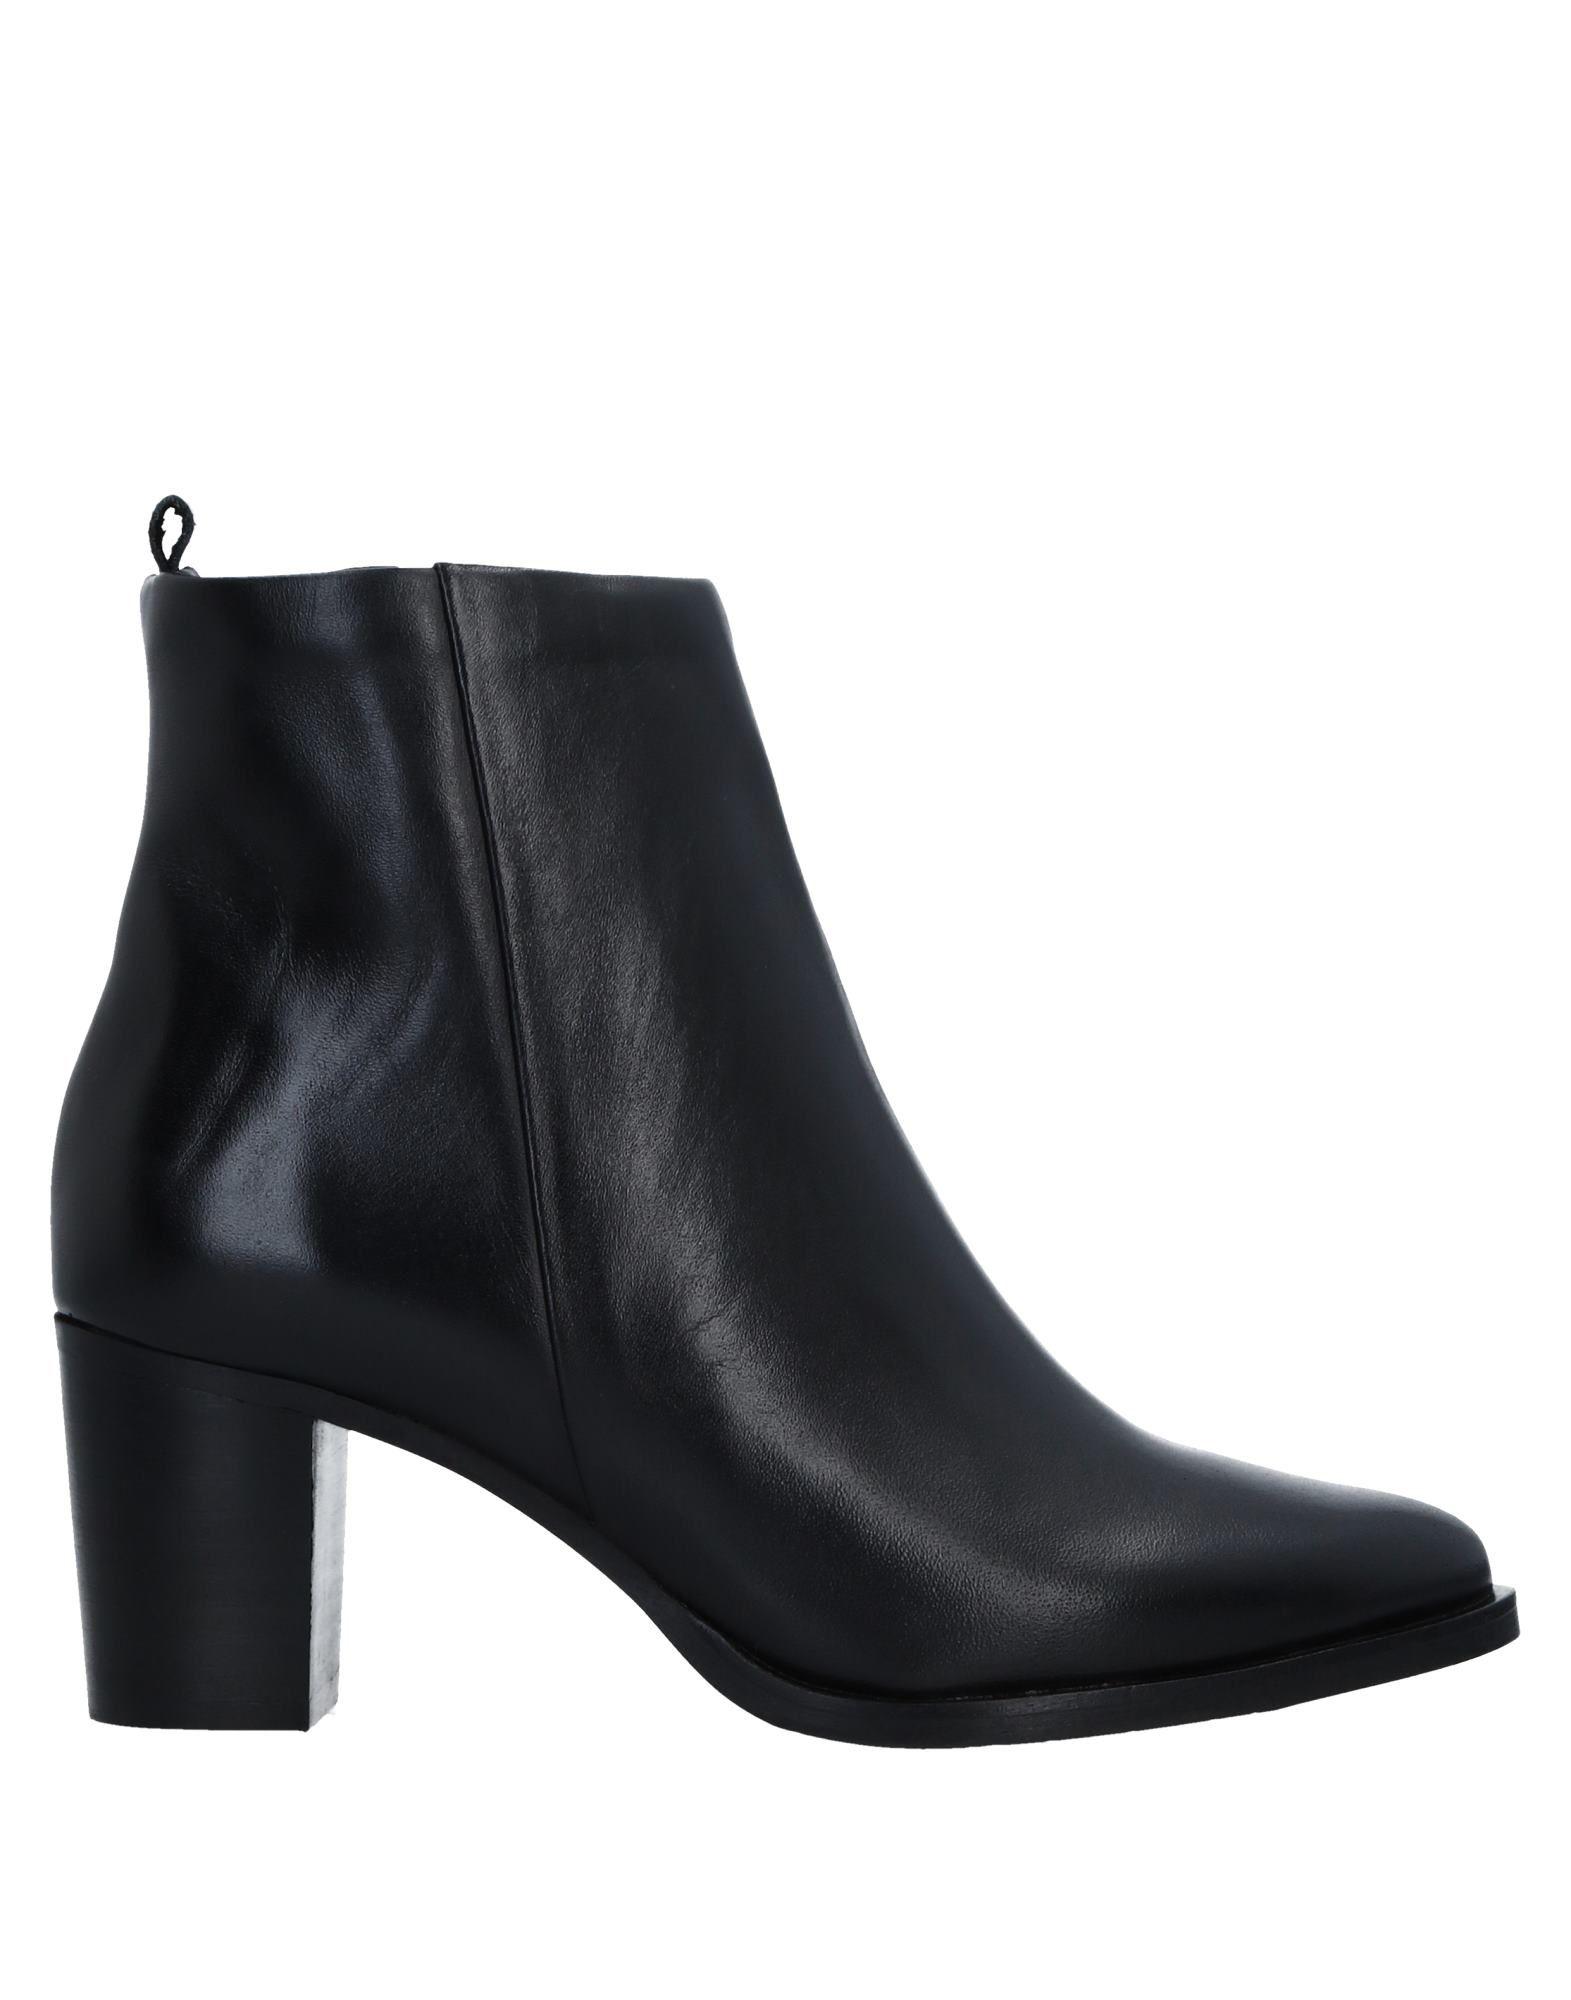 Rabatt Schuhe Royal Republiq Stiefelette 11543395OP Damen  11543395OP Stiefelette c6951c